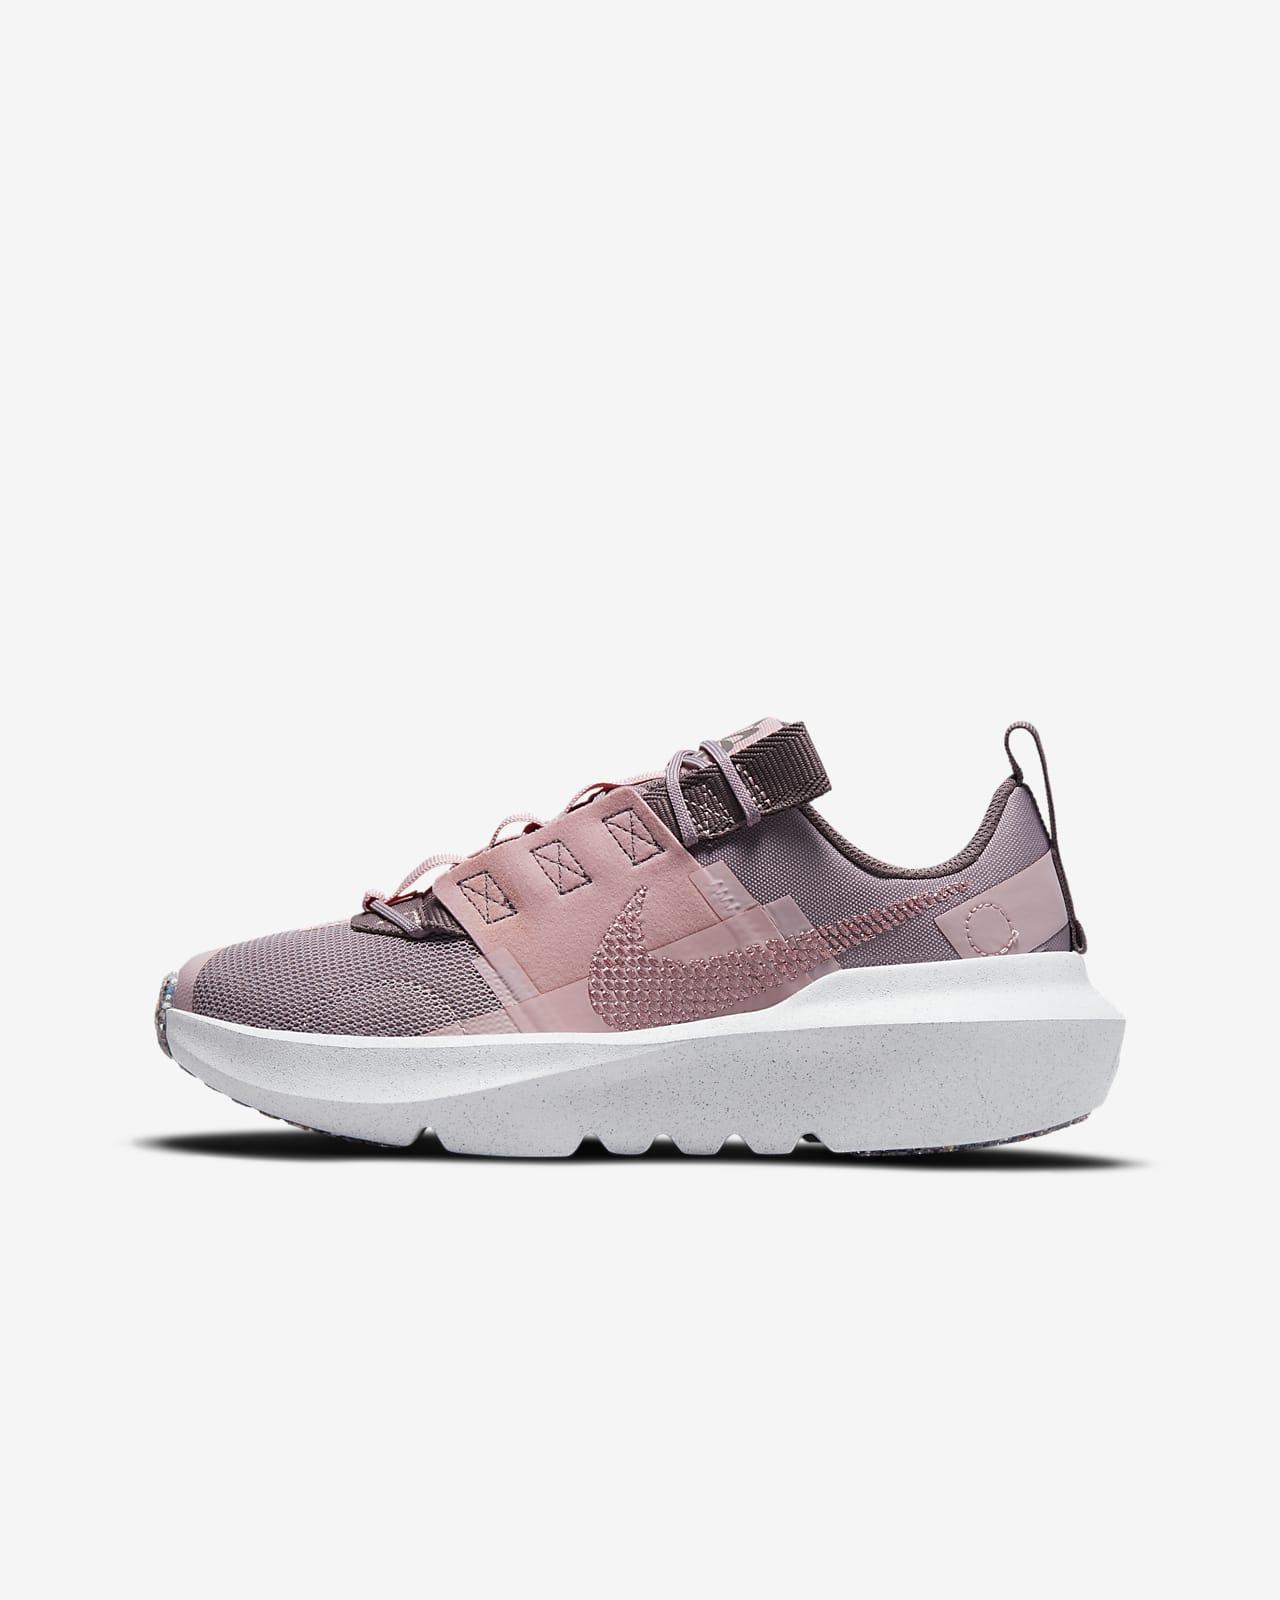 Sapatilhas Nike Crater Impact Júnior